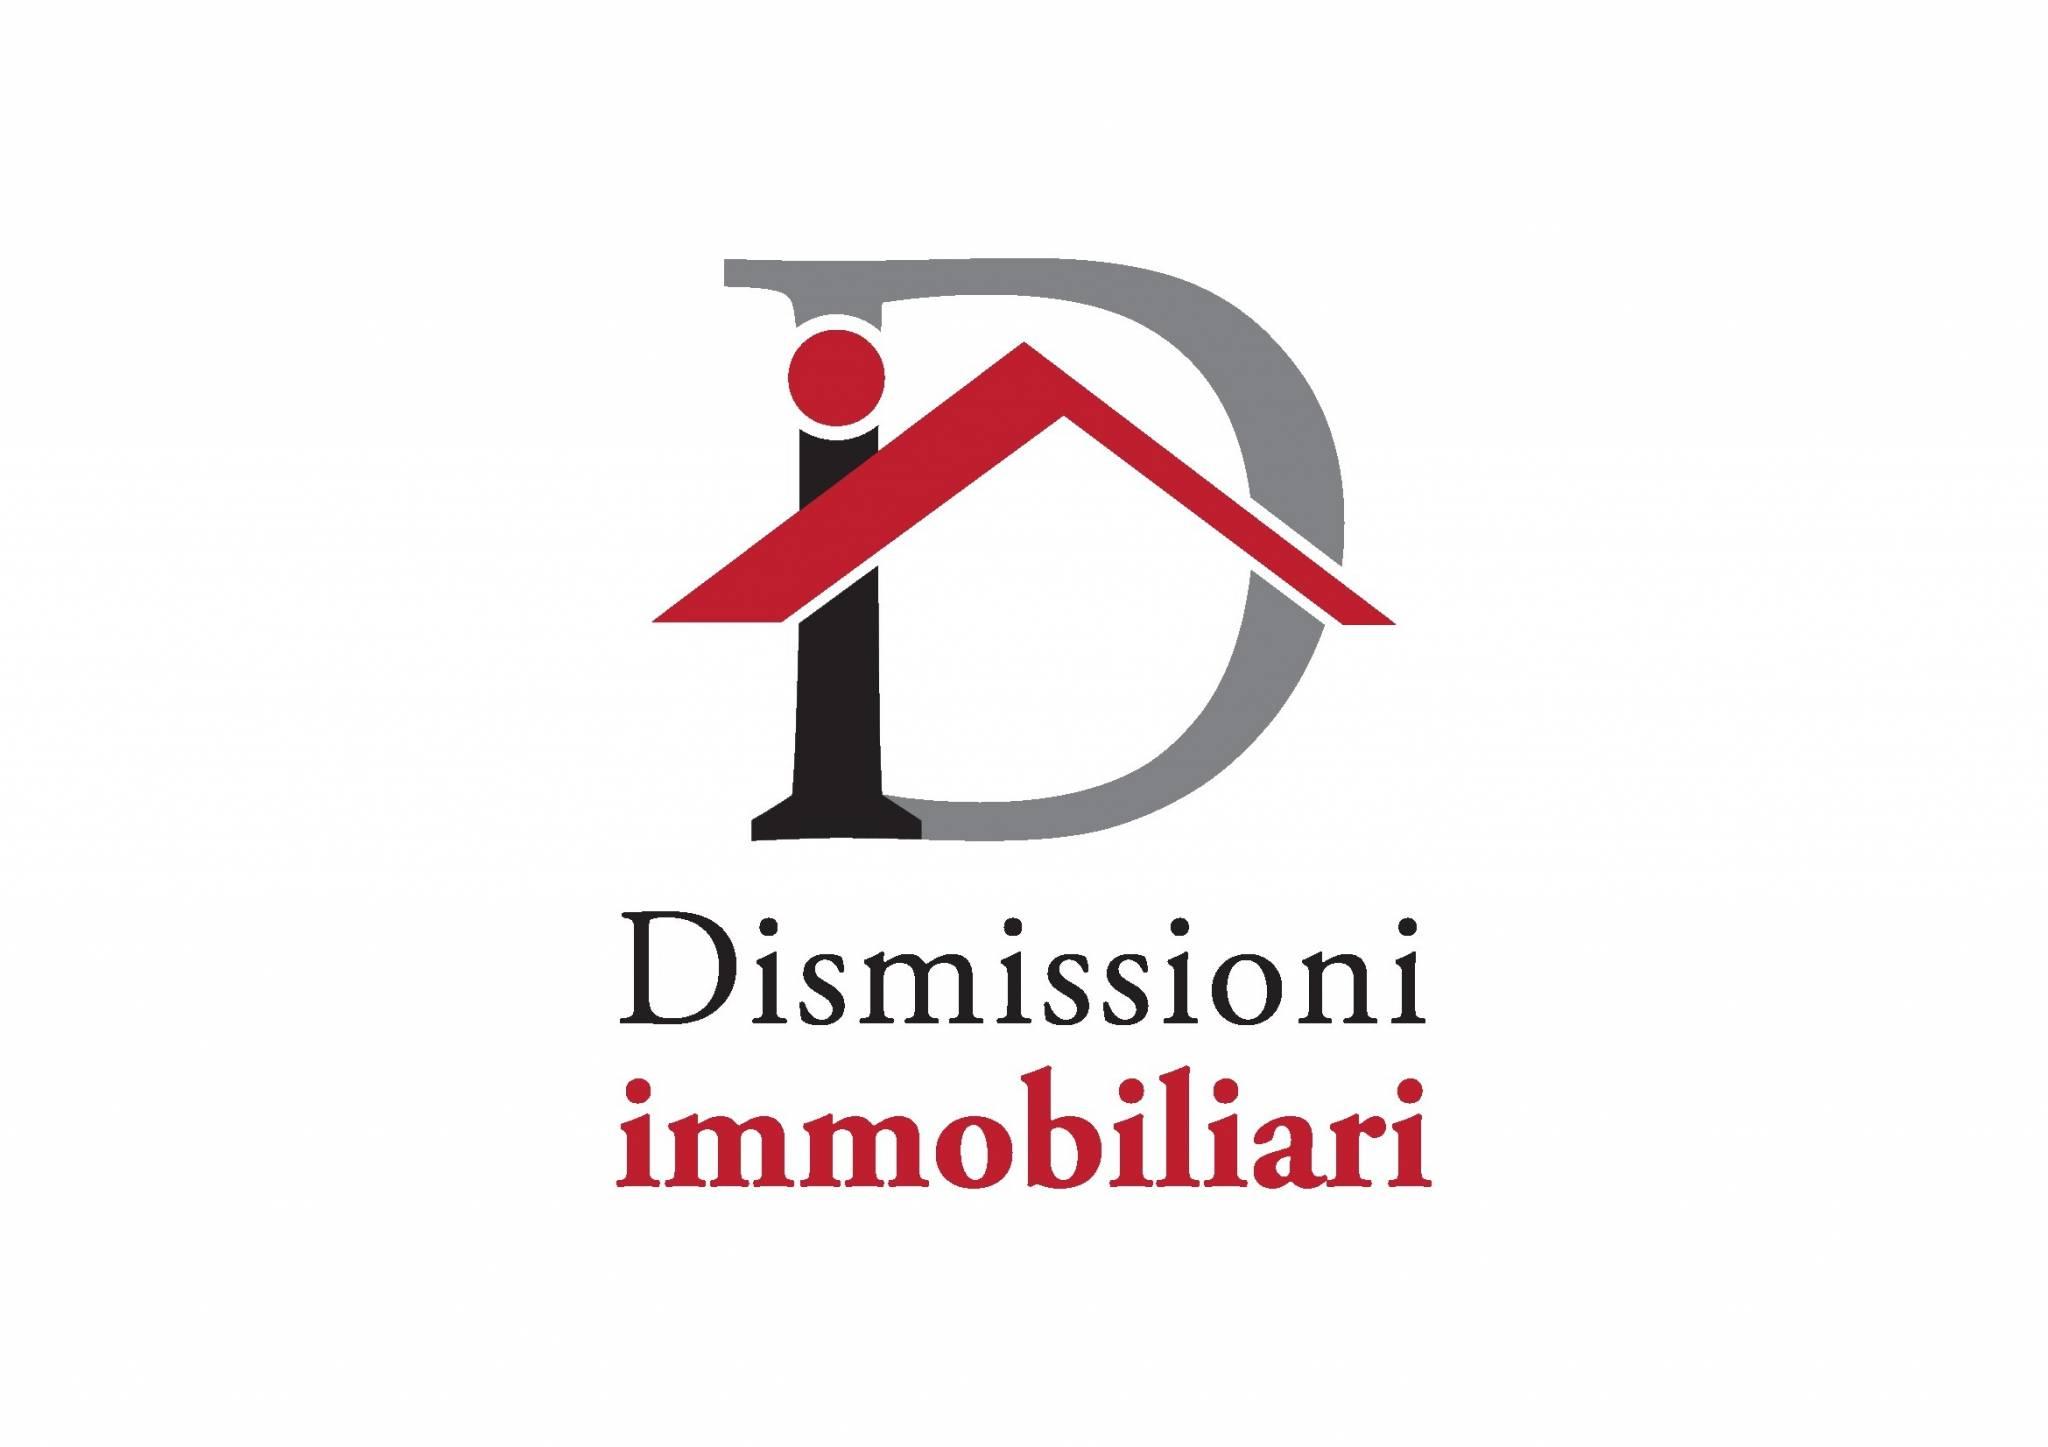 Dismissioni Immobiliari